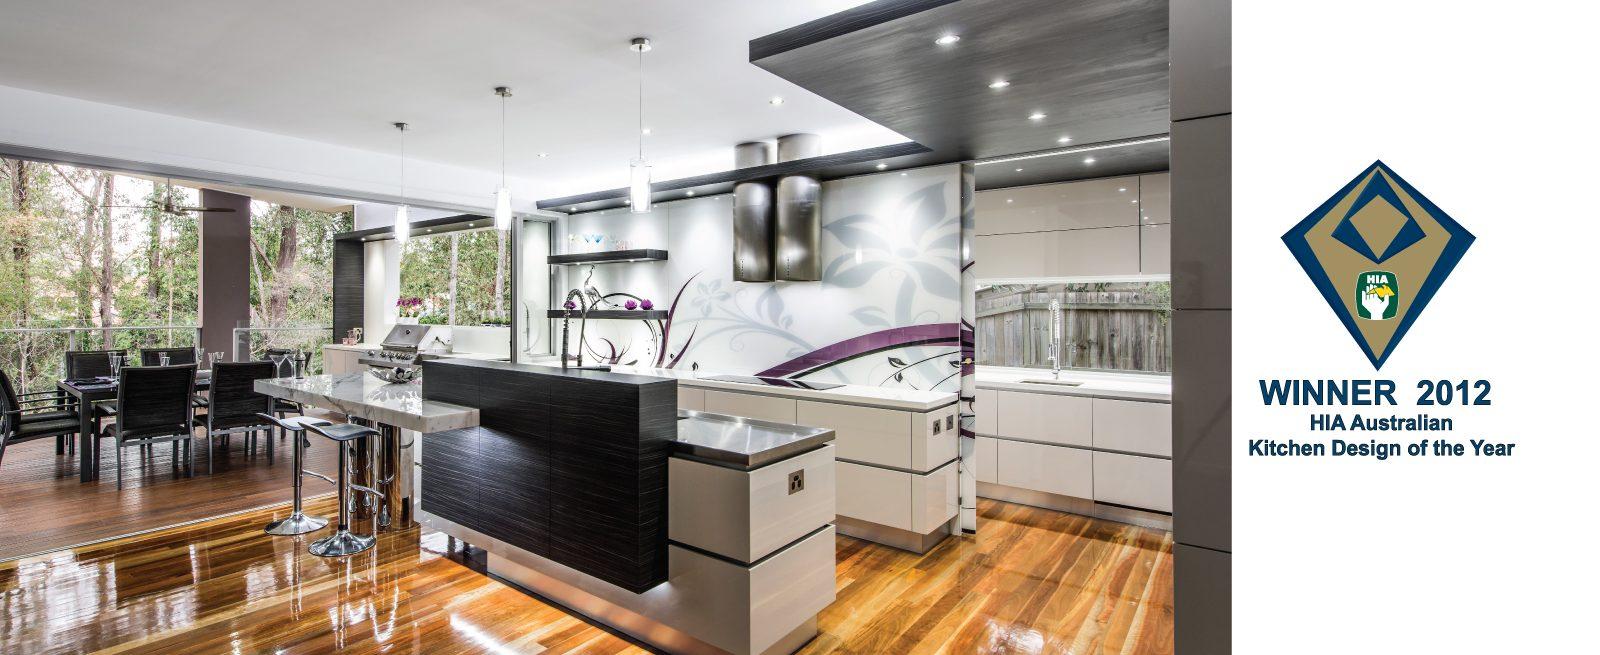 HIA Australian Kitchen Design of the Year -Kim Duffin